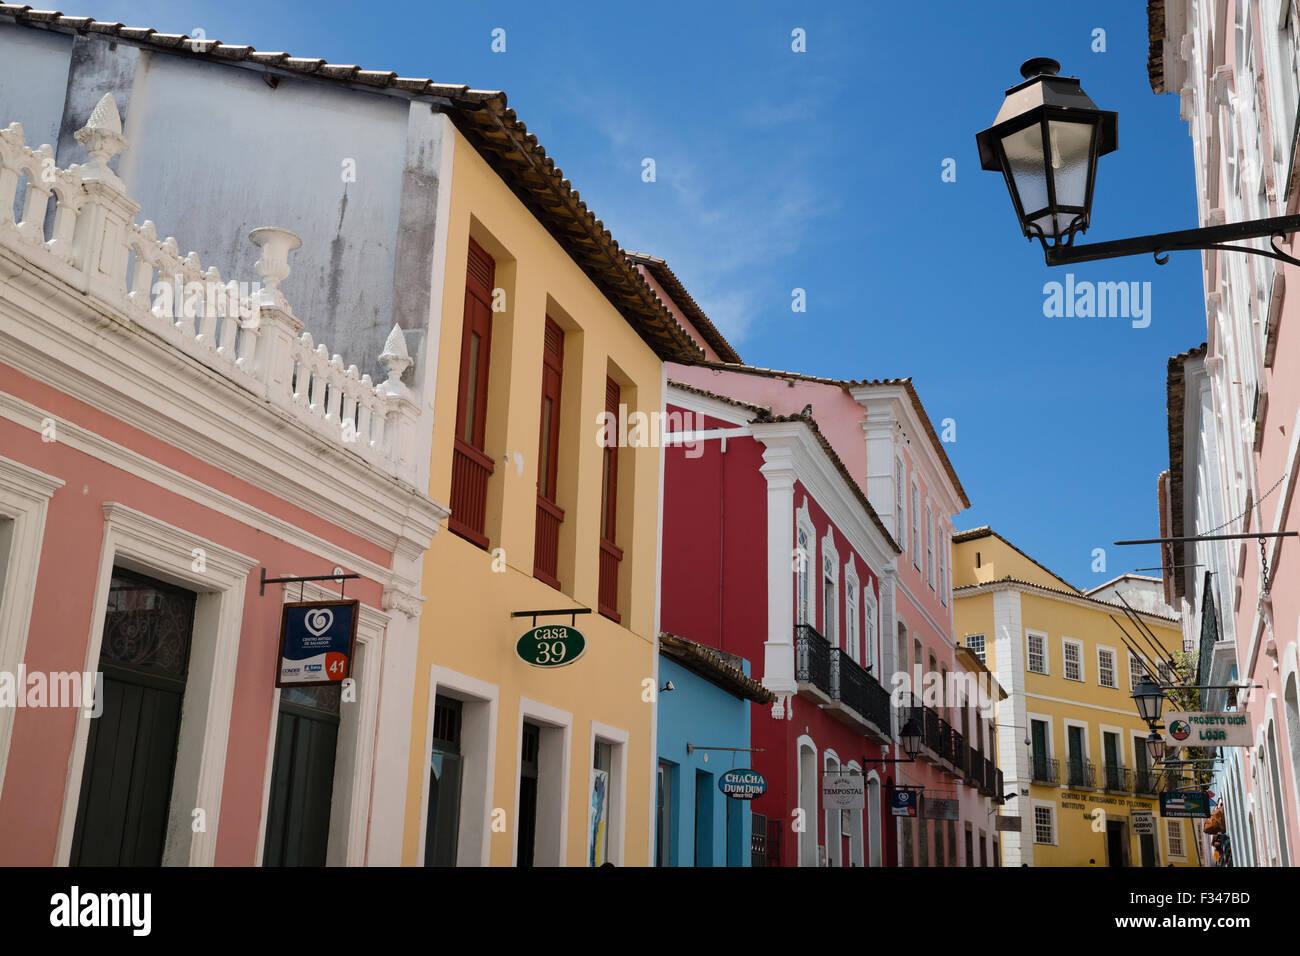 Kolonialarchitektur in der Altstadt, Salvador, Brasilien Stockbild